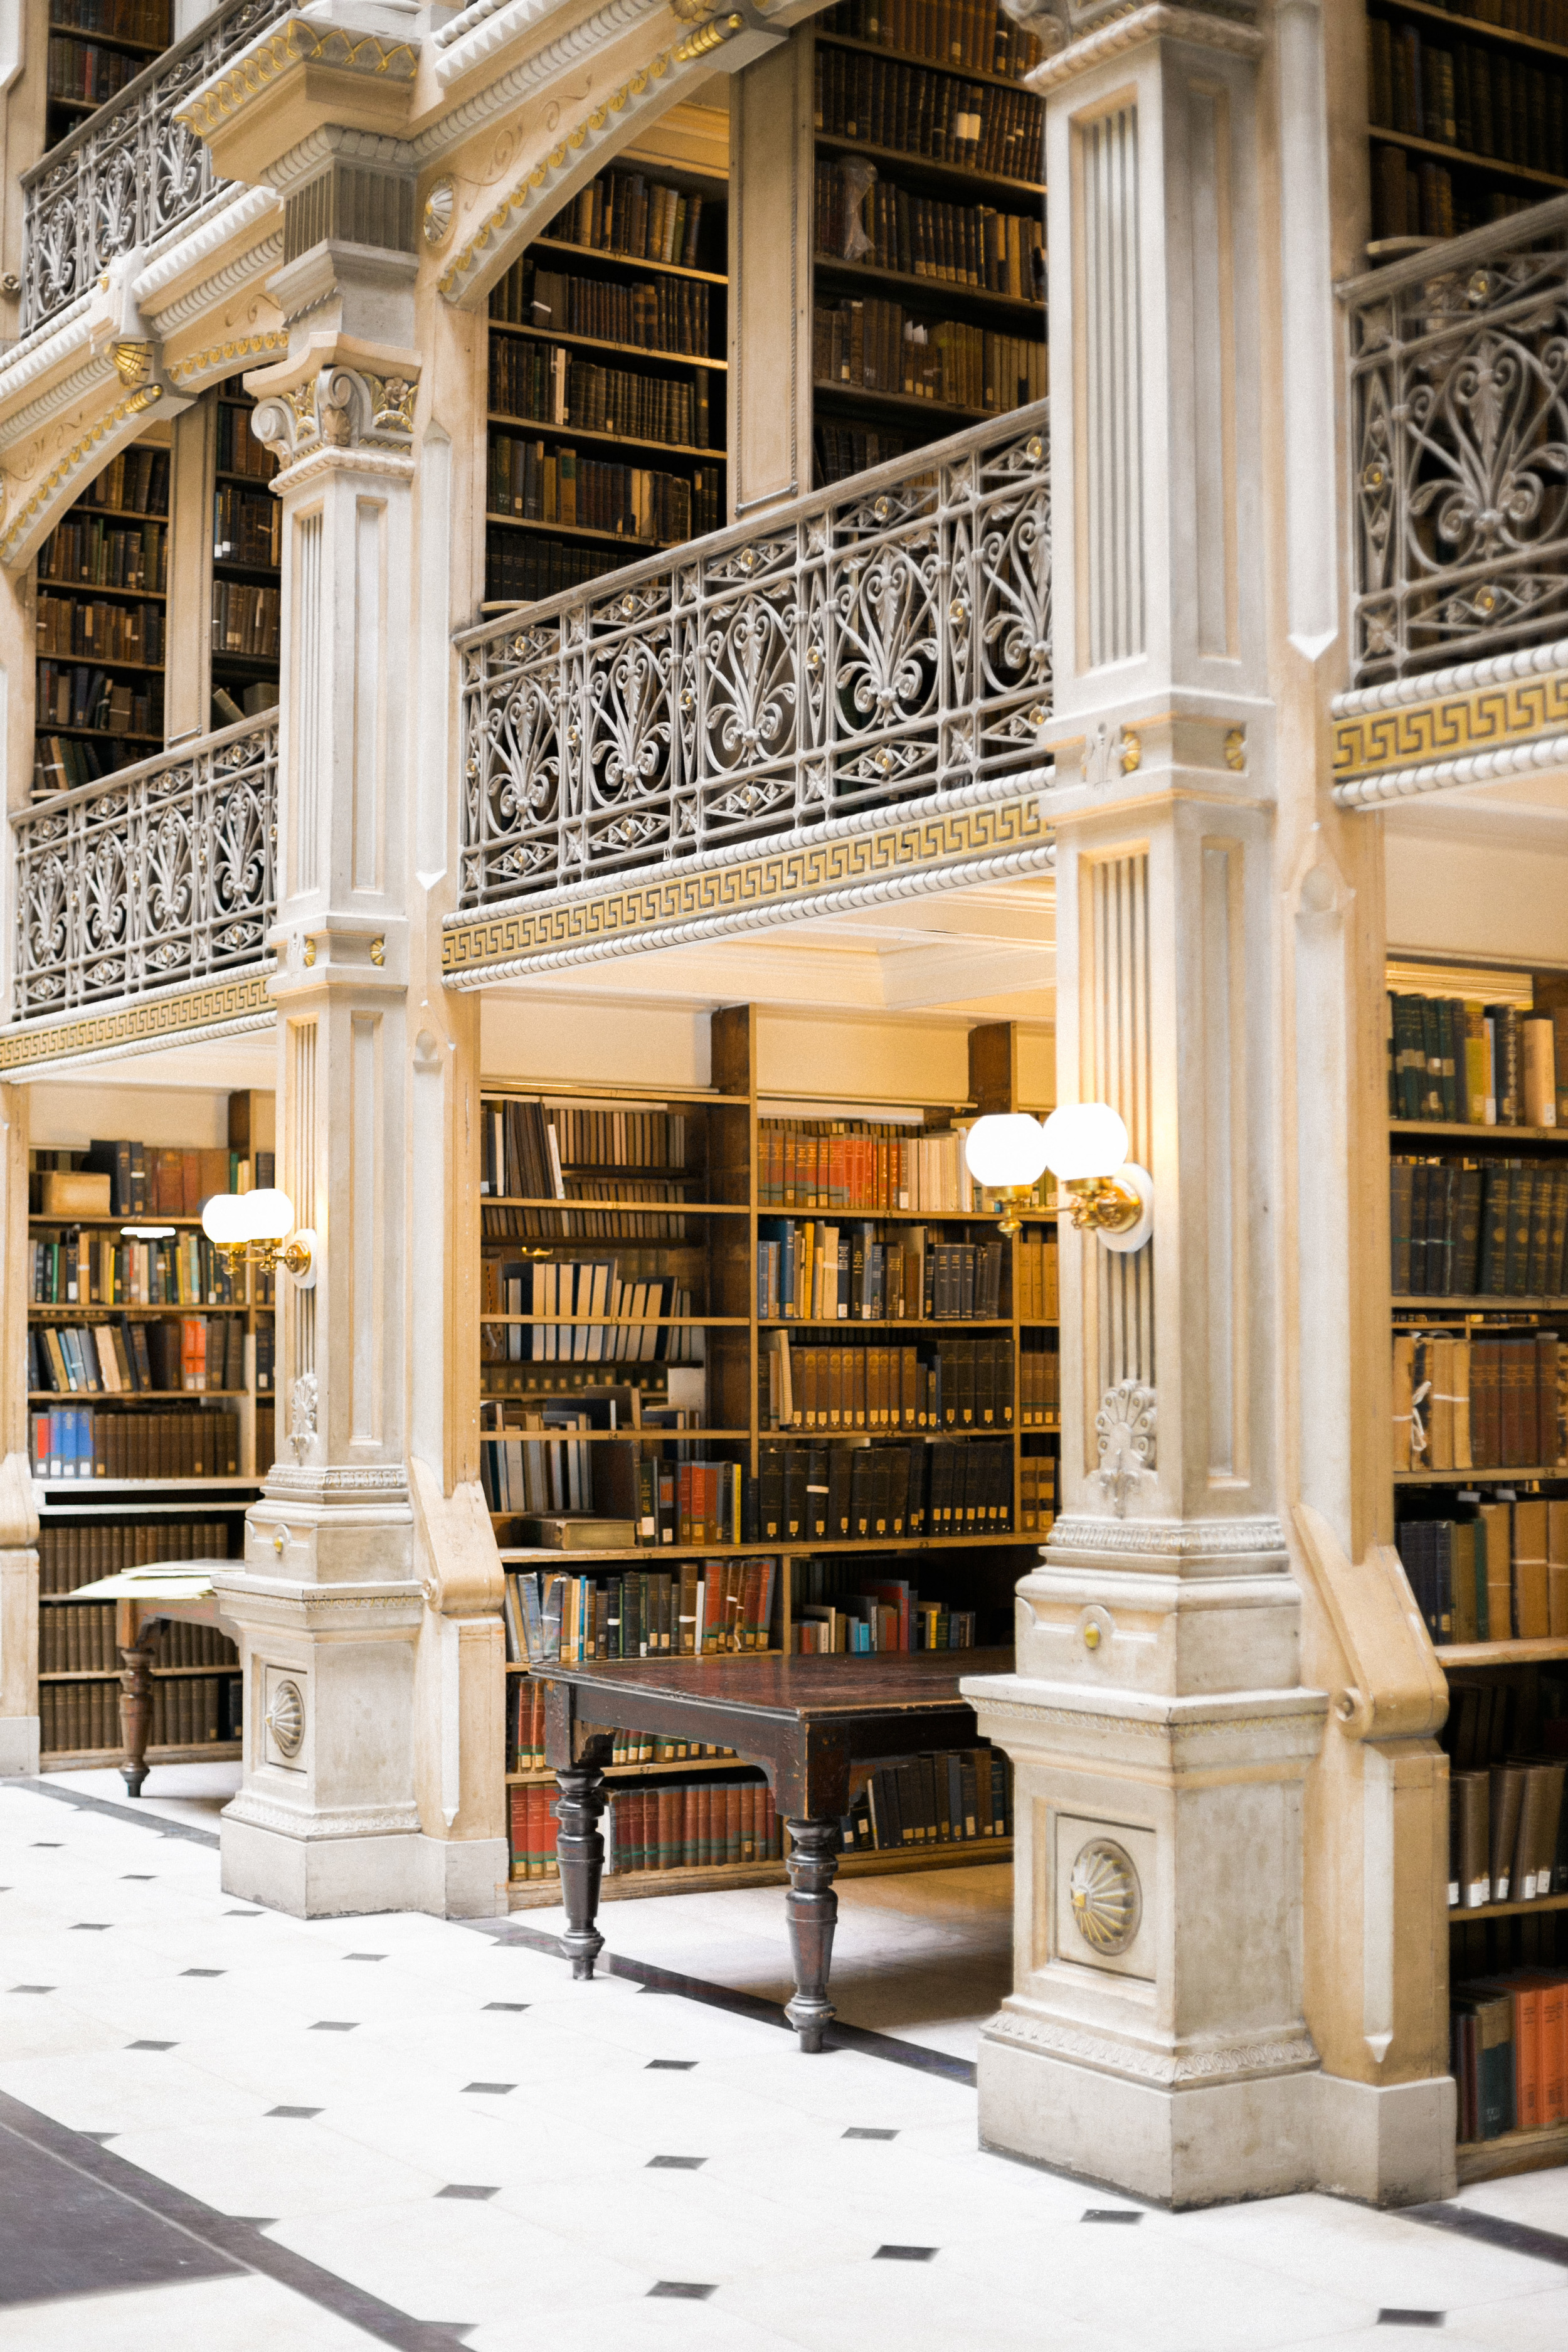 Peabody_Library_007.jpg